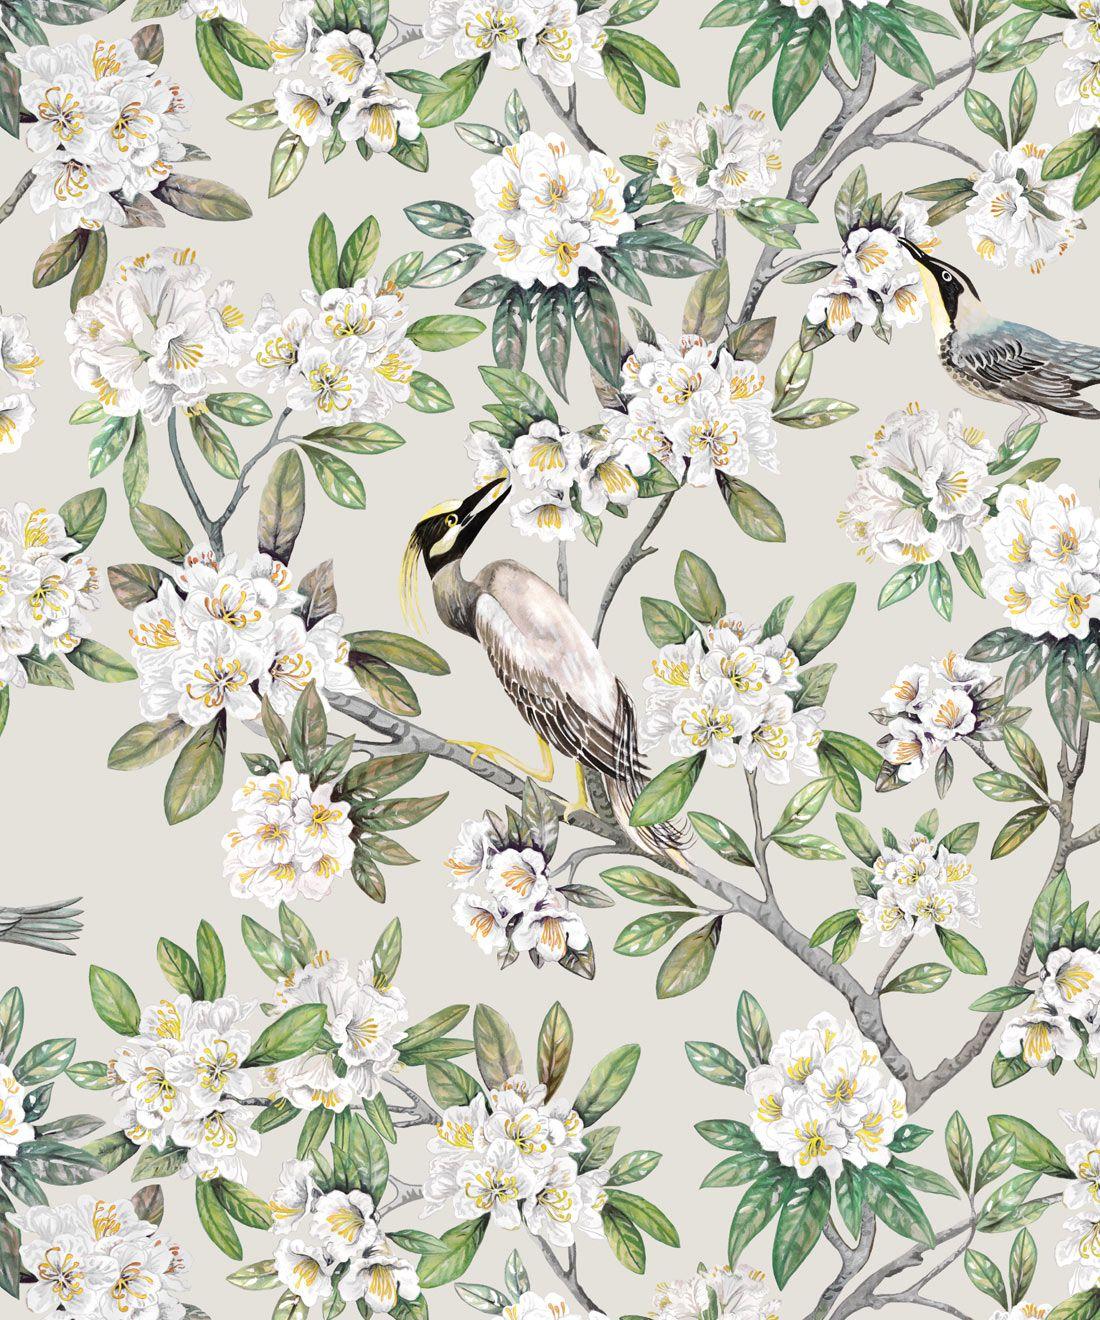 Victoria Wallpaper • Floral Wallpaper • Ivory Wallpaper • Swatch